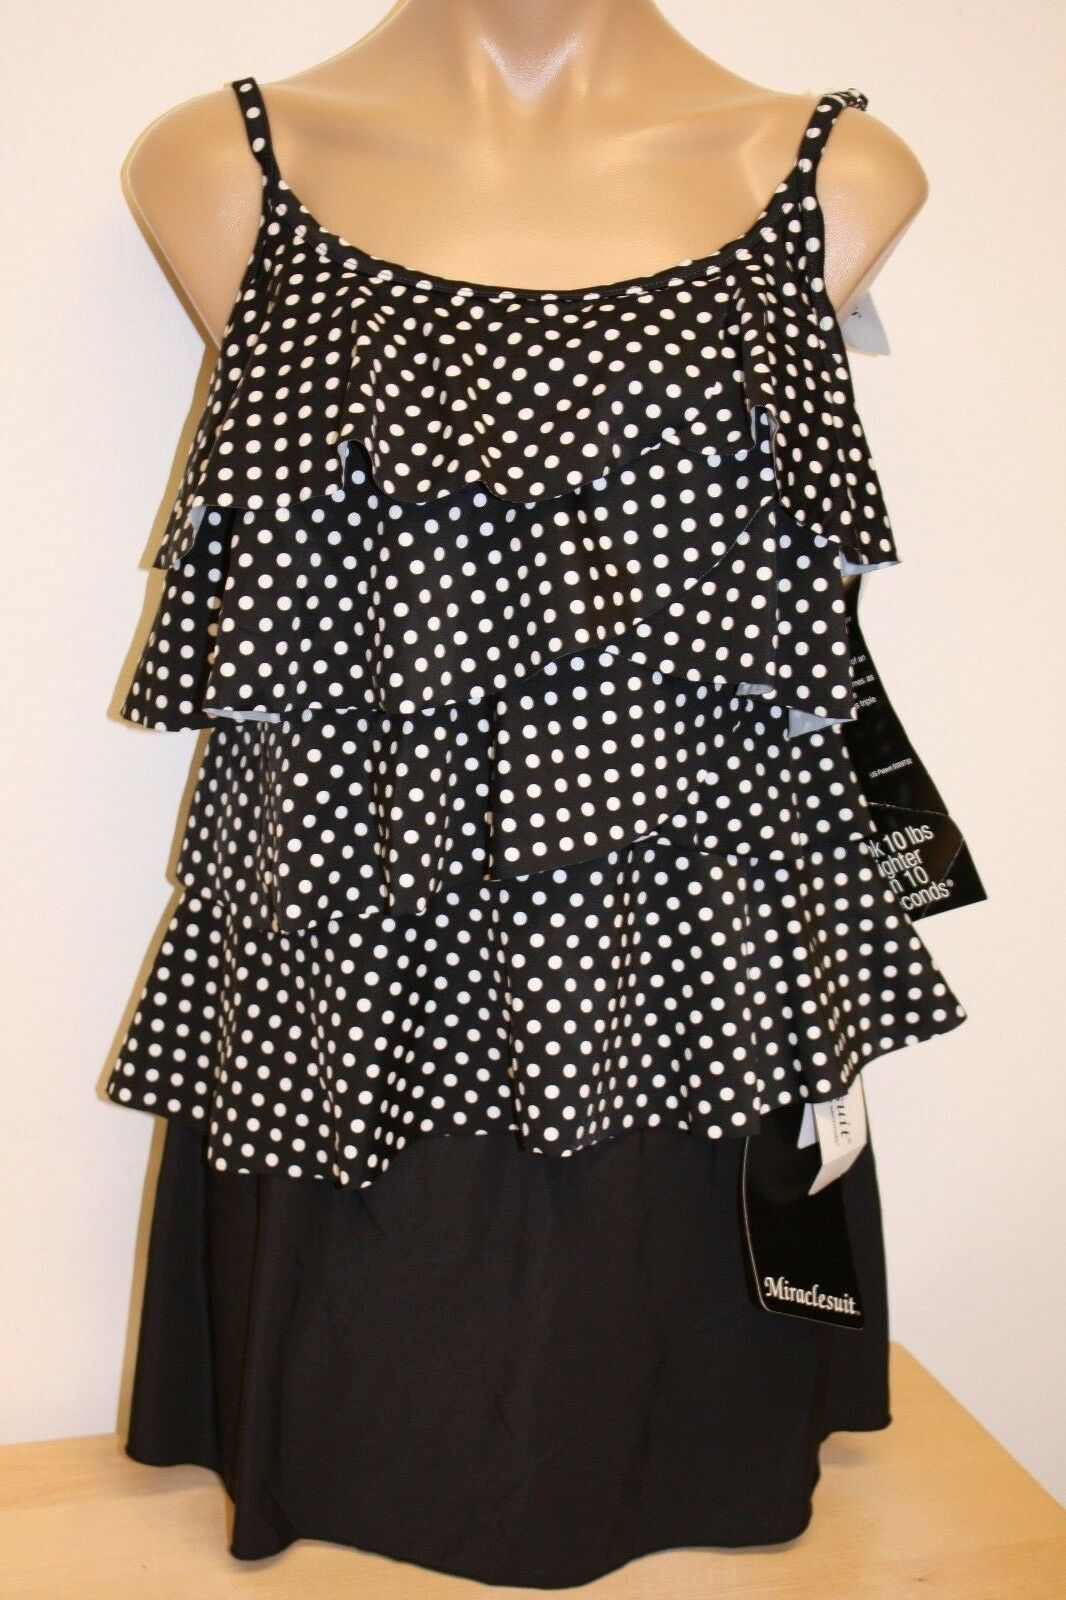 NWT Miraclesuit Swimsuit Tankini 2 pc set sz 10 BLW Ruffles Skirt Tier Up